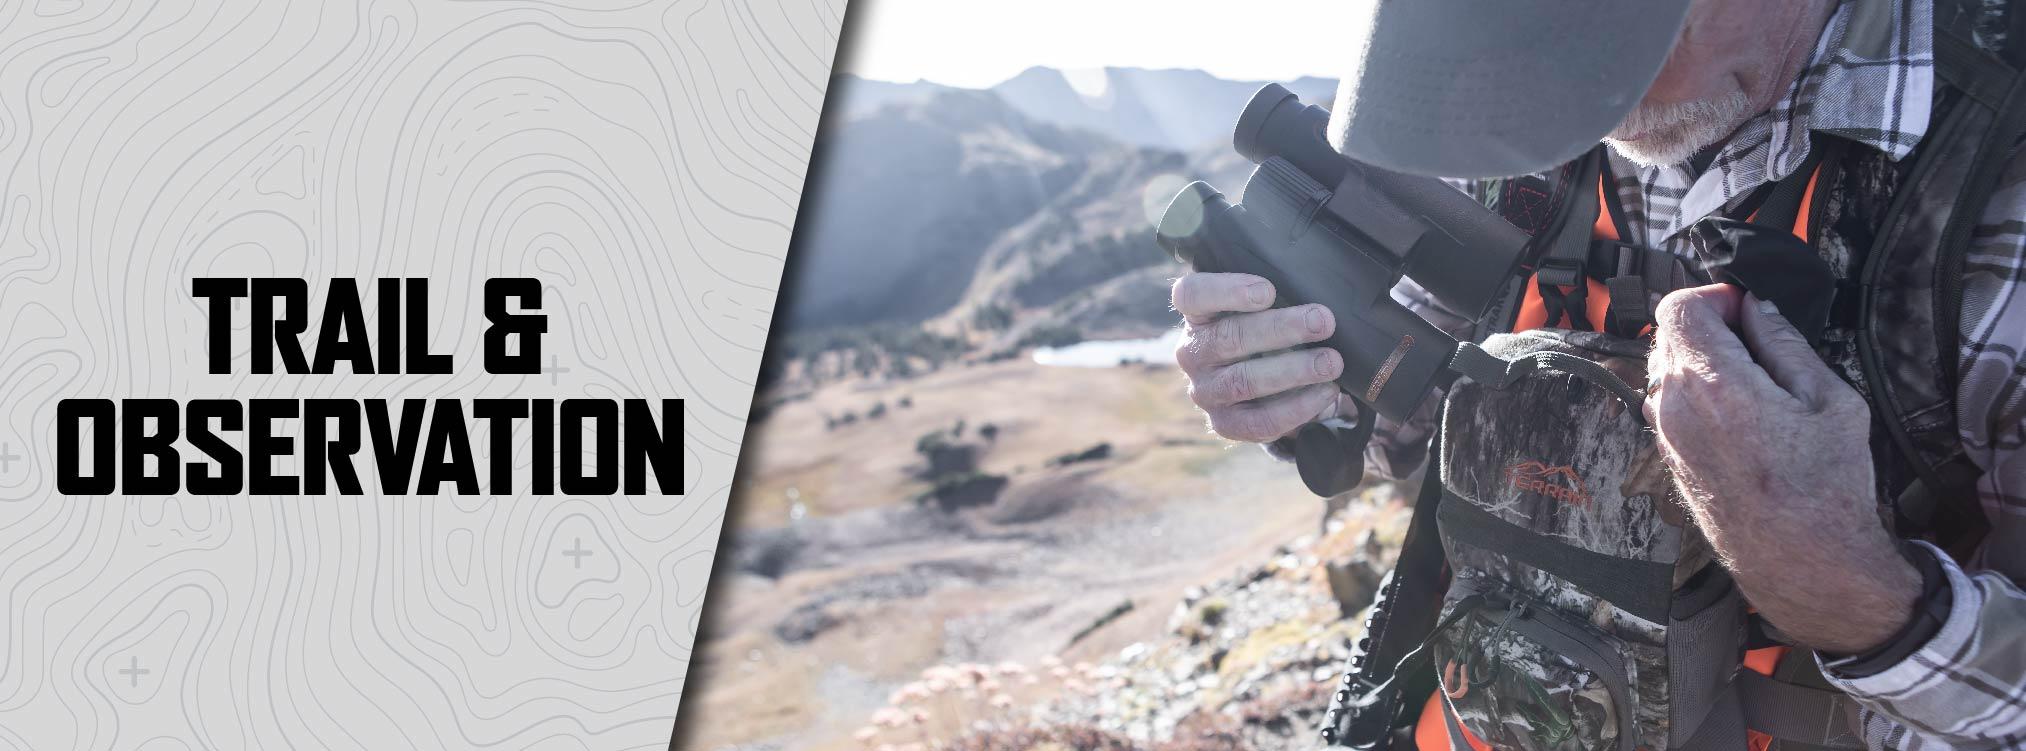 Trail & Observation